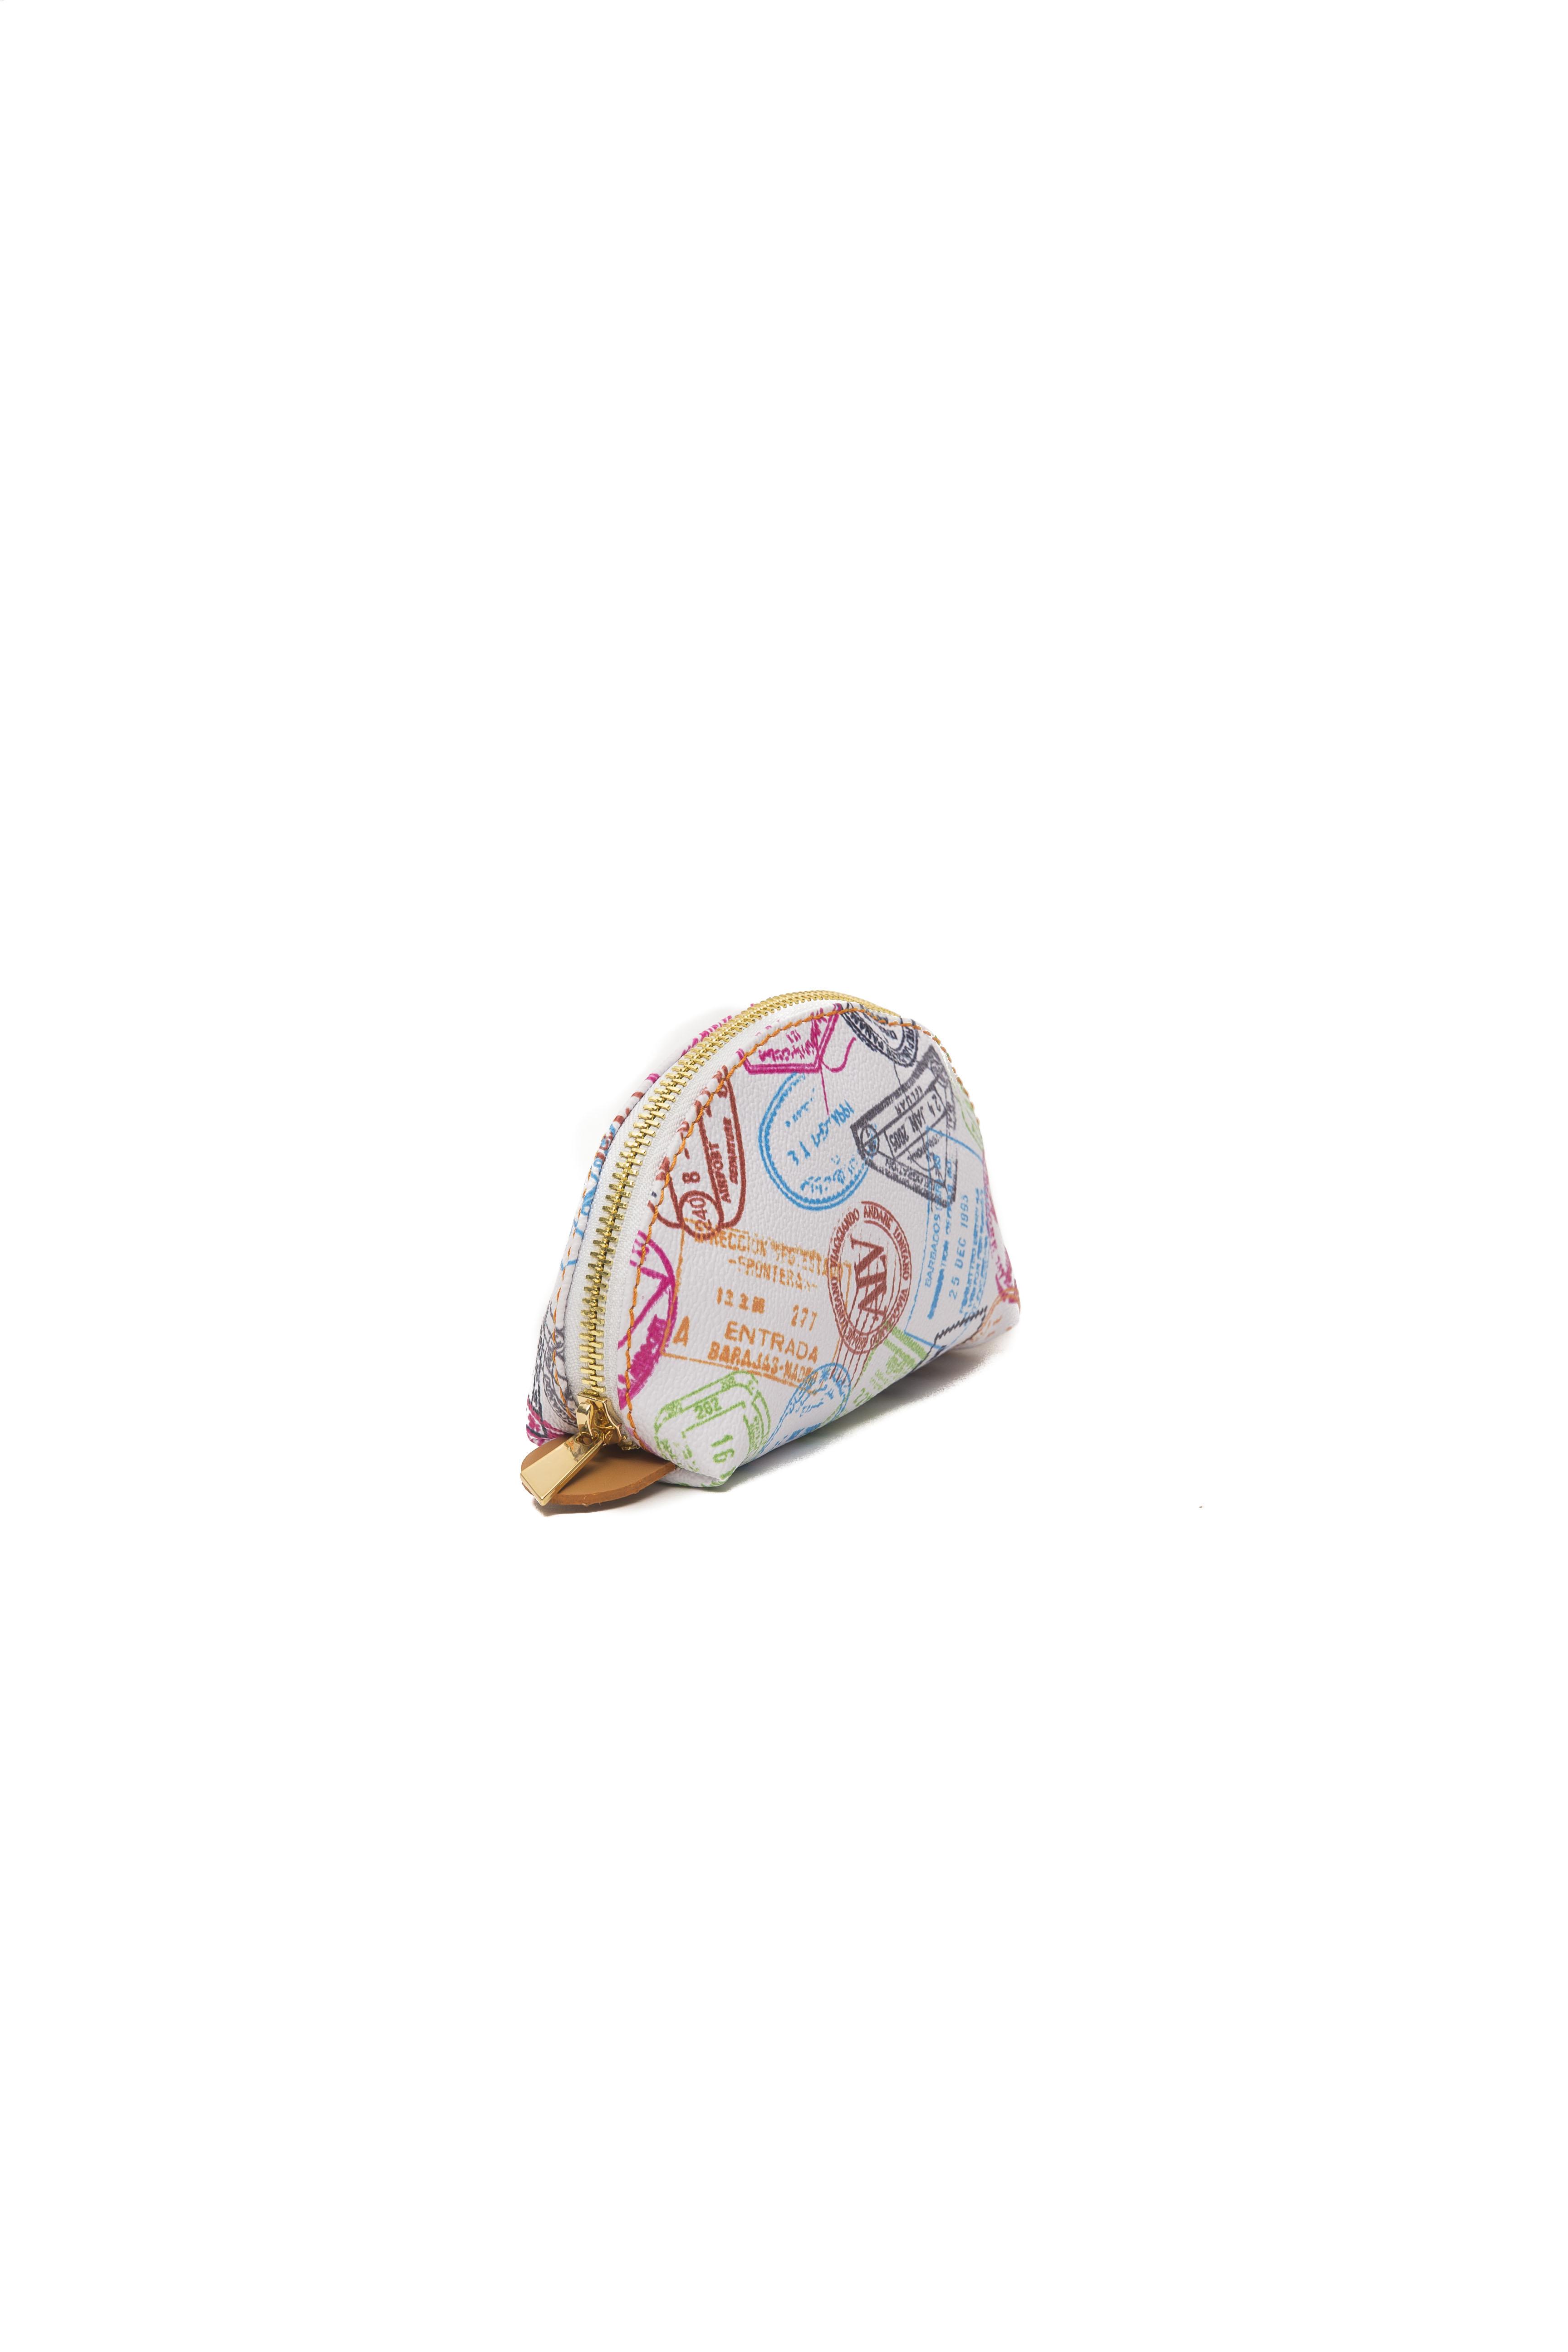 Blanc Femme Alviero Wallet Ever117d016b Martini qMVGUpzLS